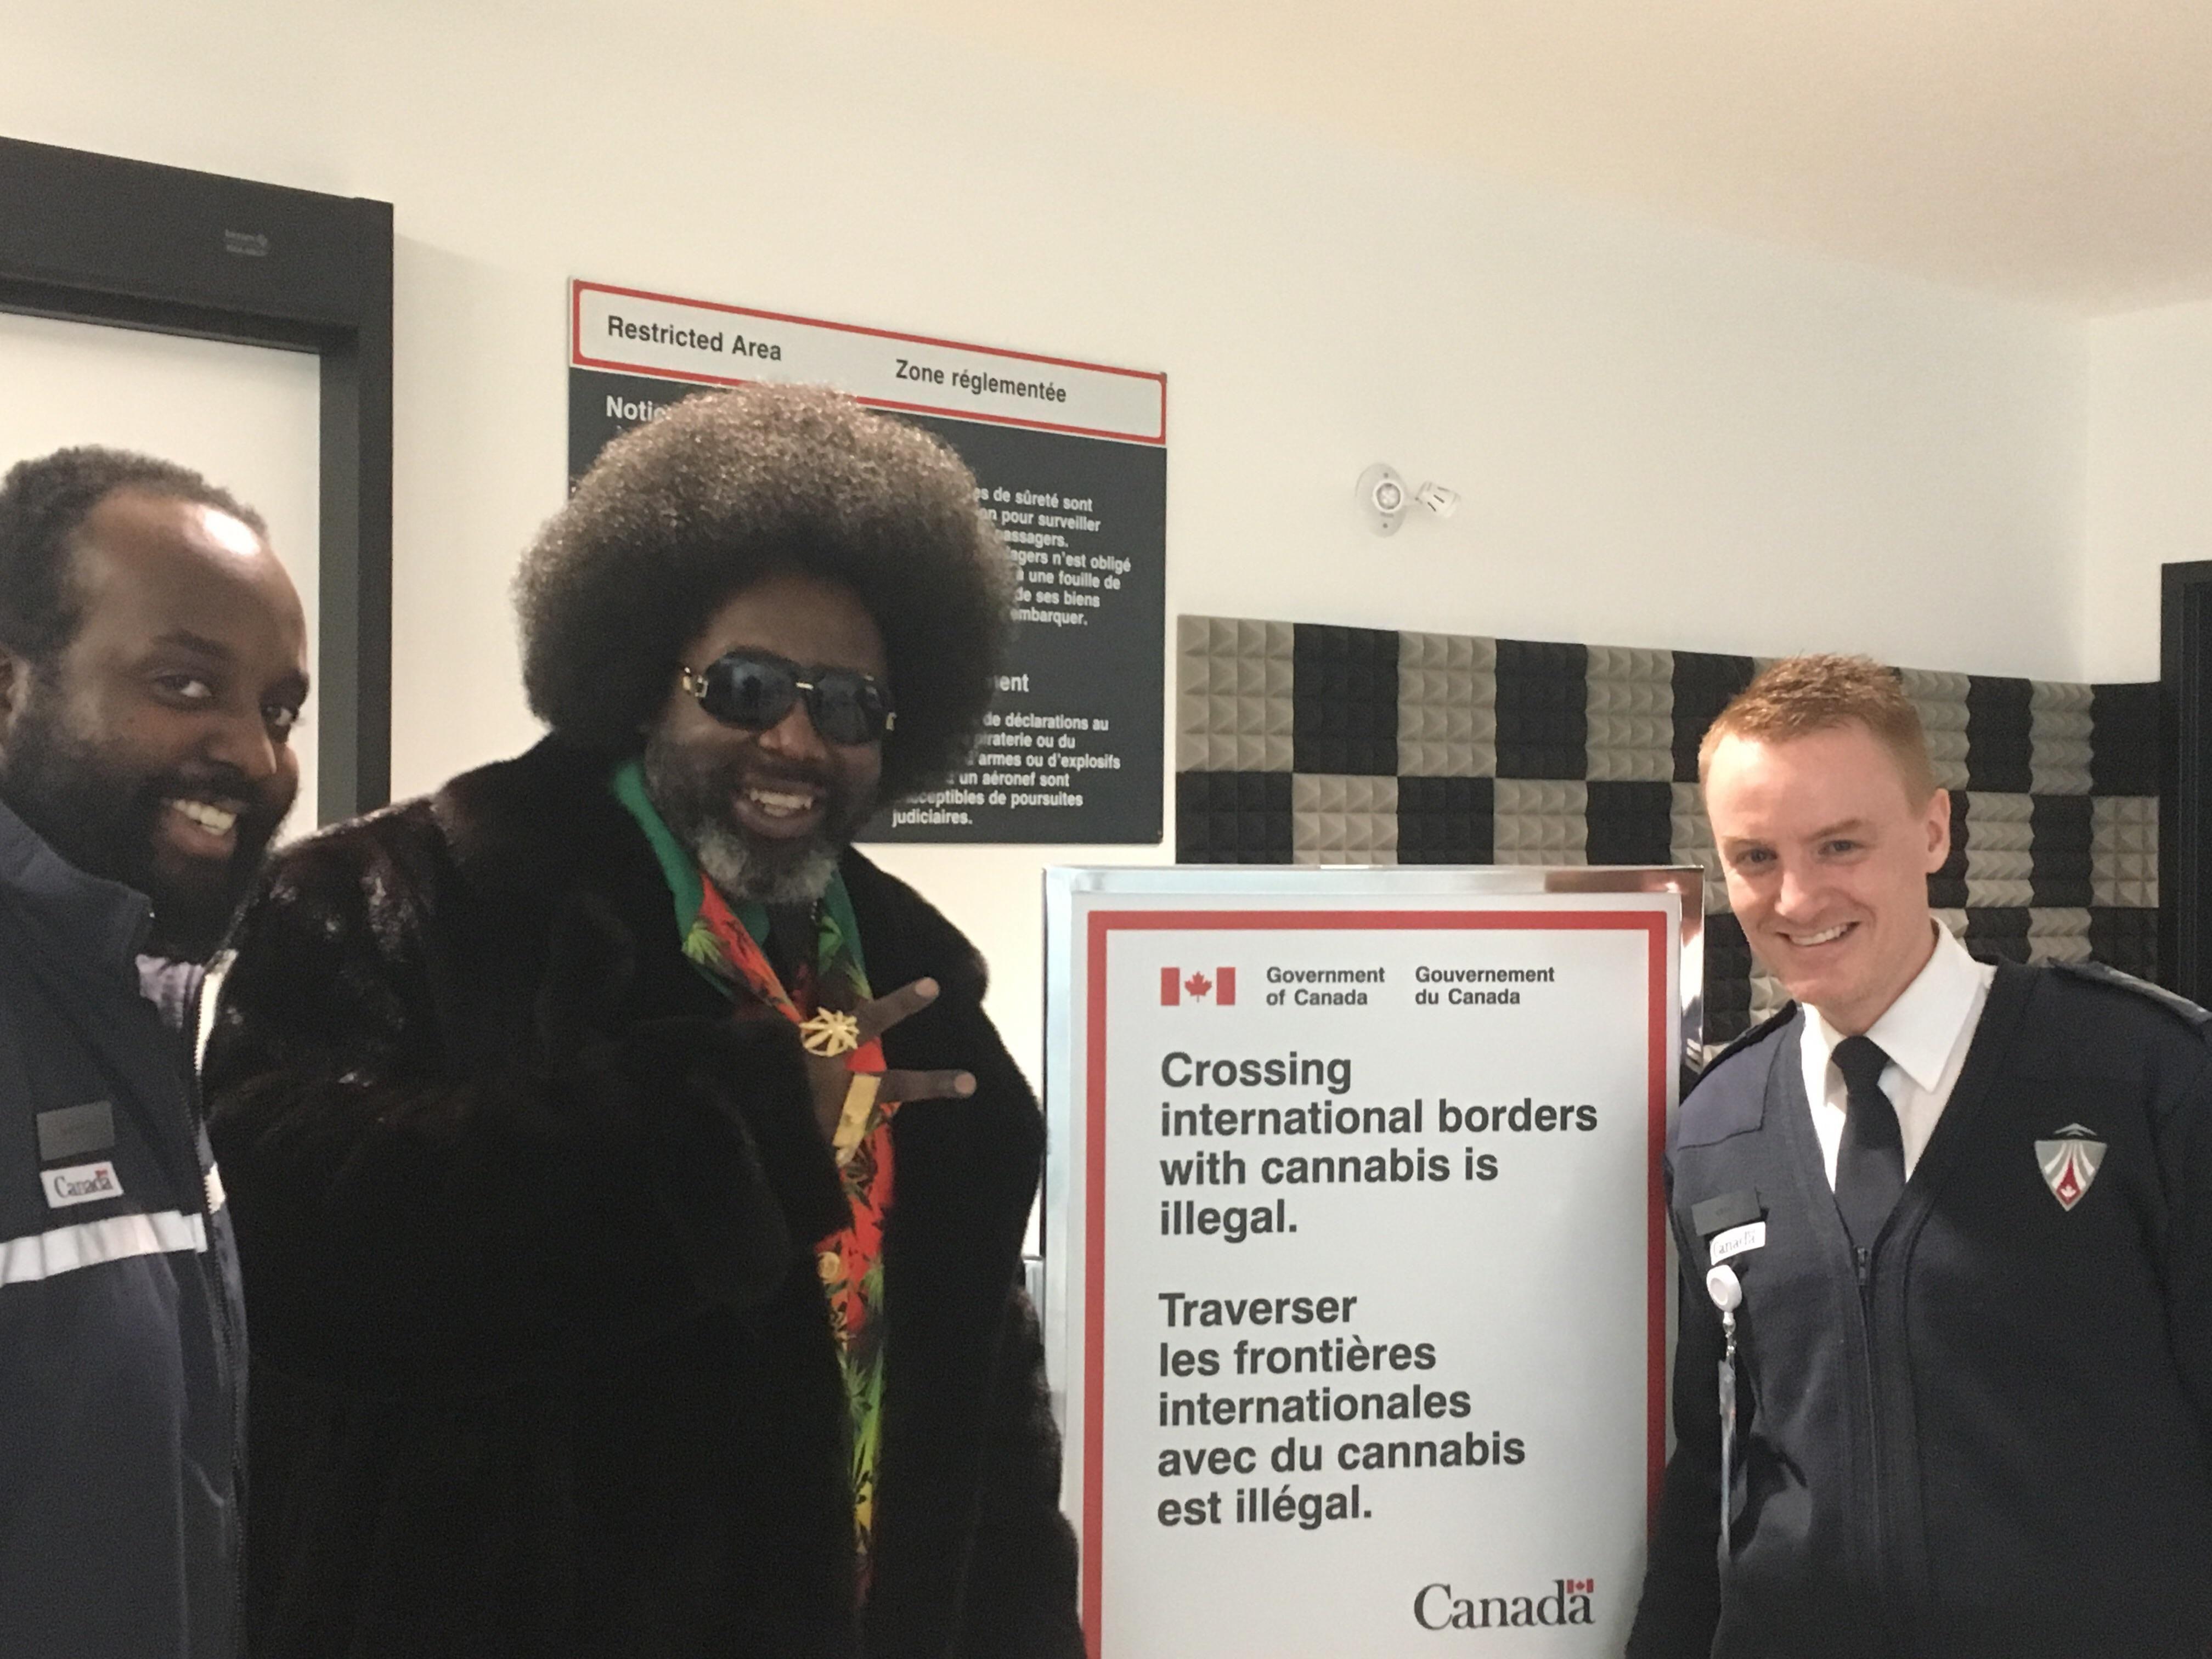 Met Afroman at work today